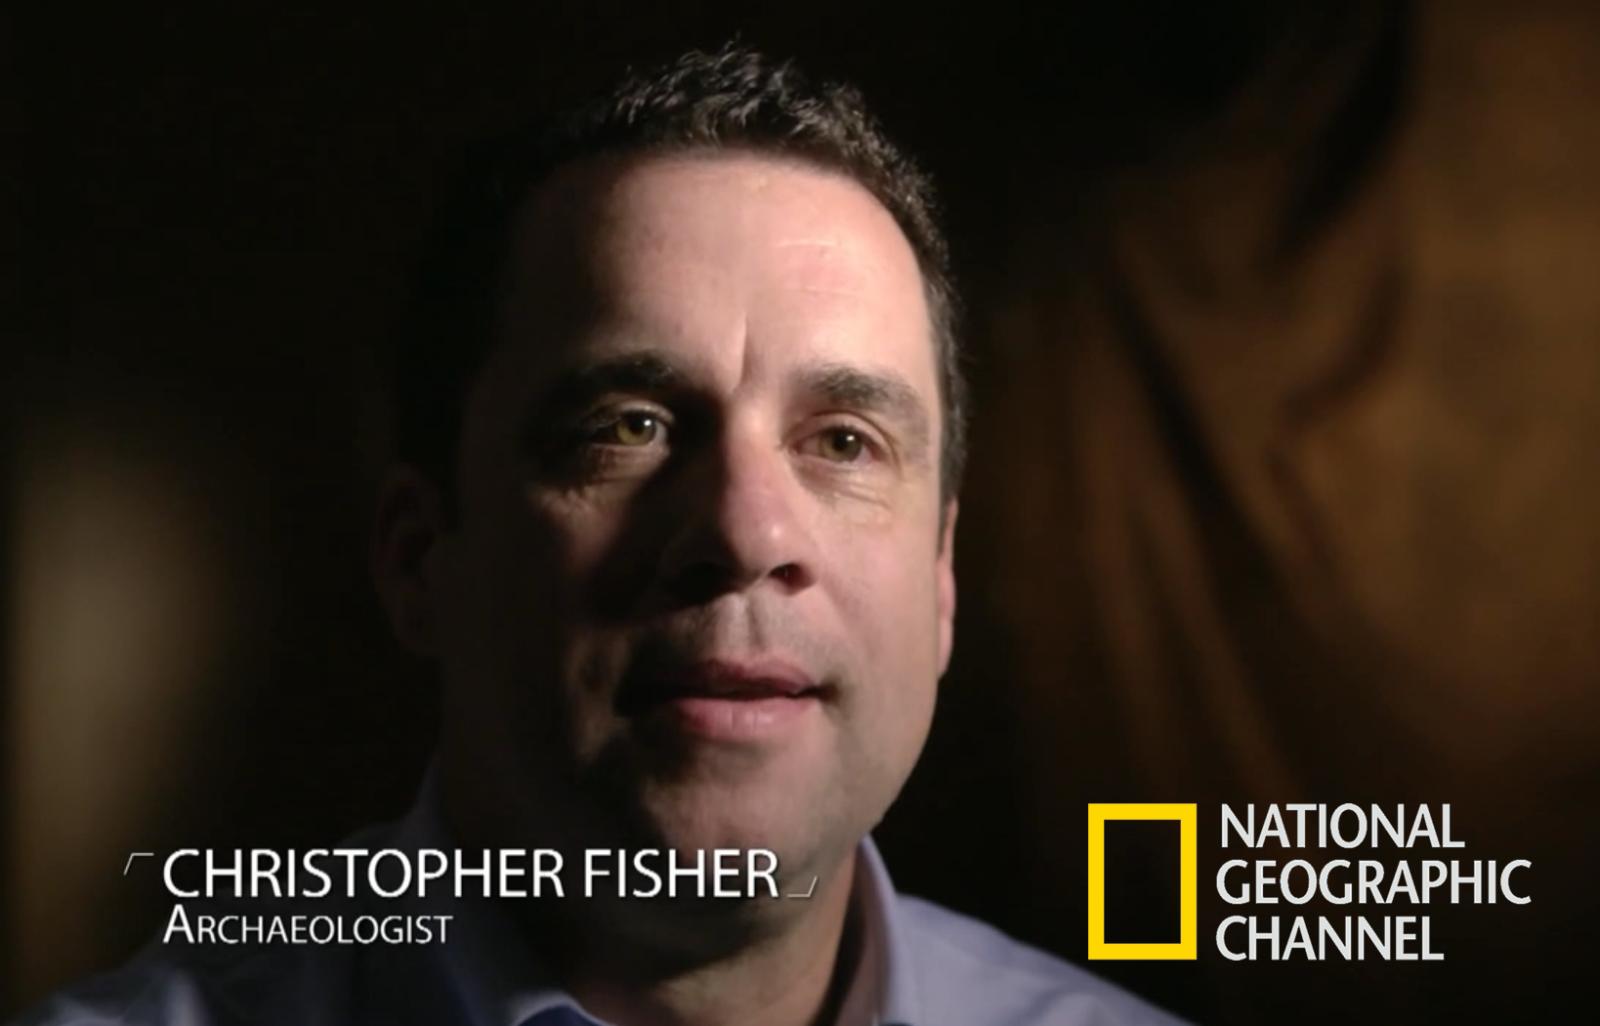 Fisher_interview_headshot